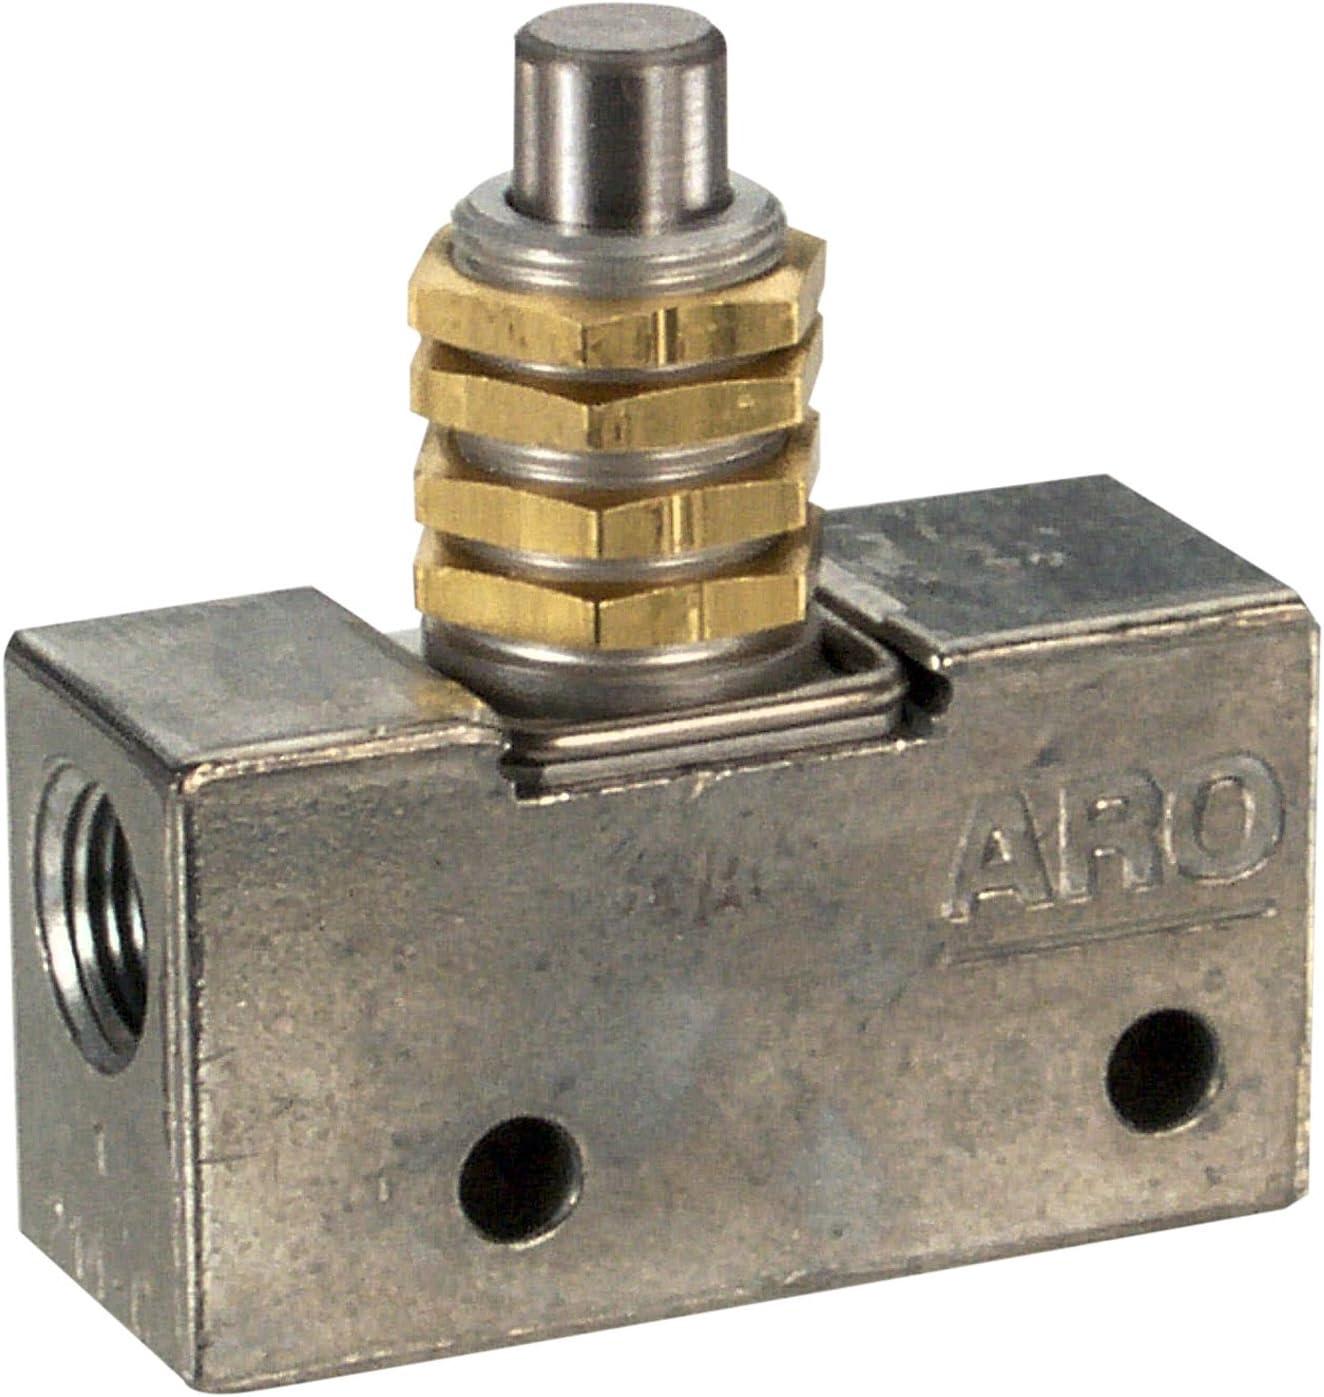 ARO 214-C Manual Air Control Valve,3-Way,1//8in NPT